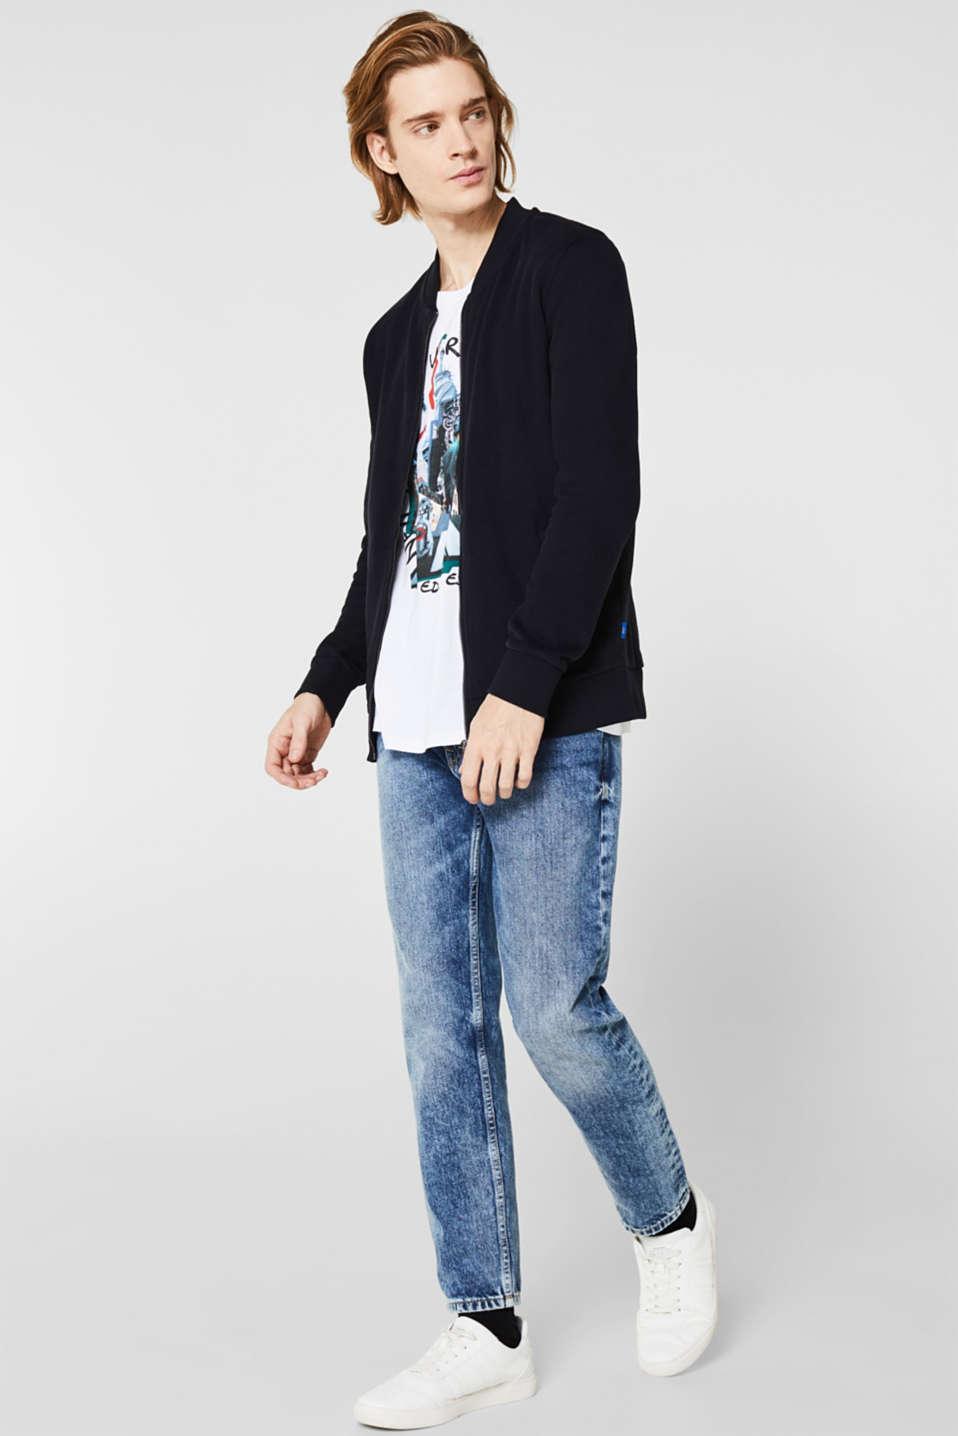 Bomber-style sweatshirt jacket, 100% cotton, BLACK, detail image number 1